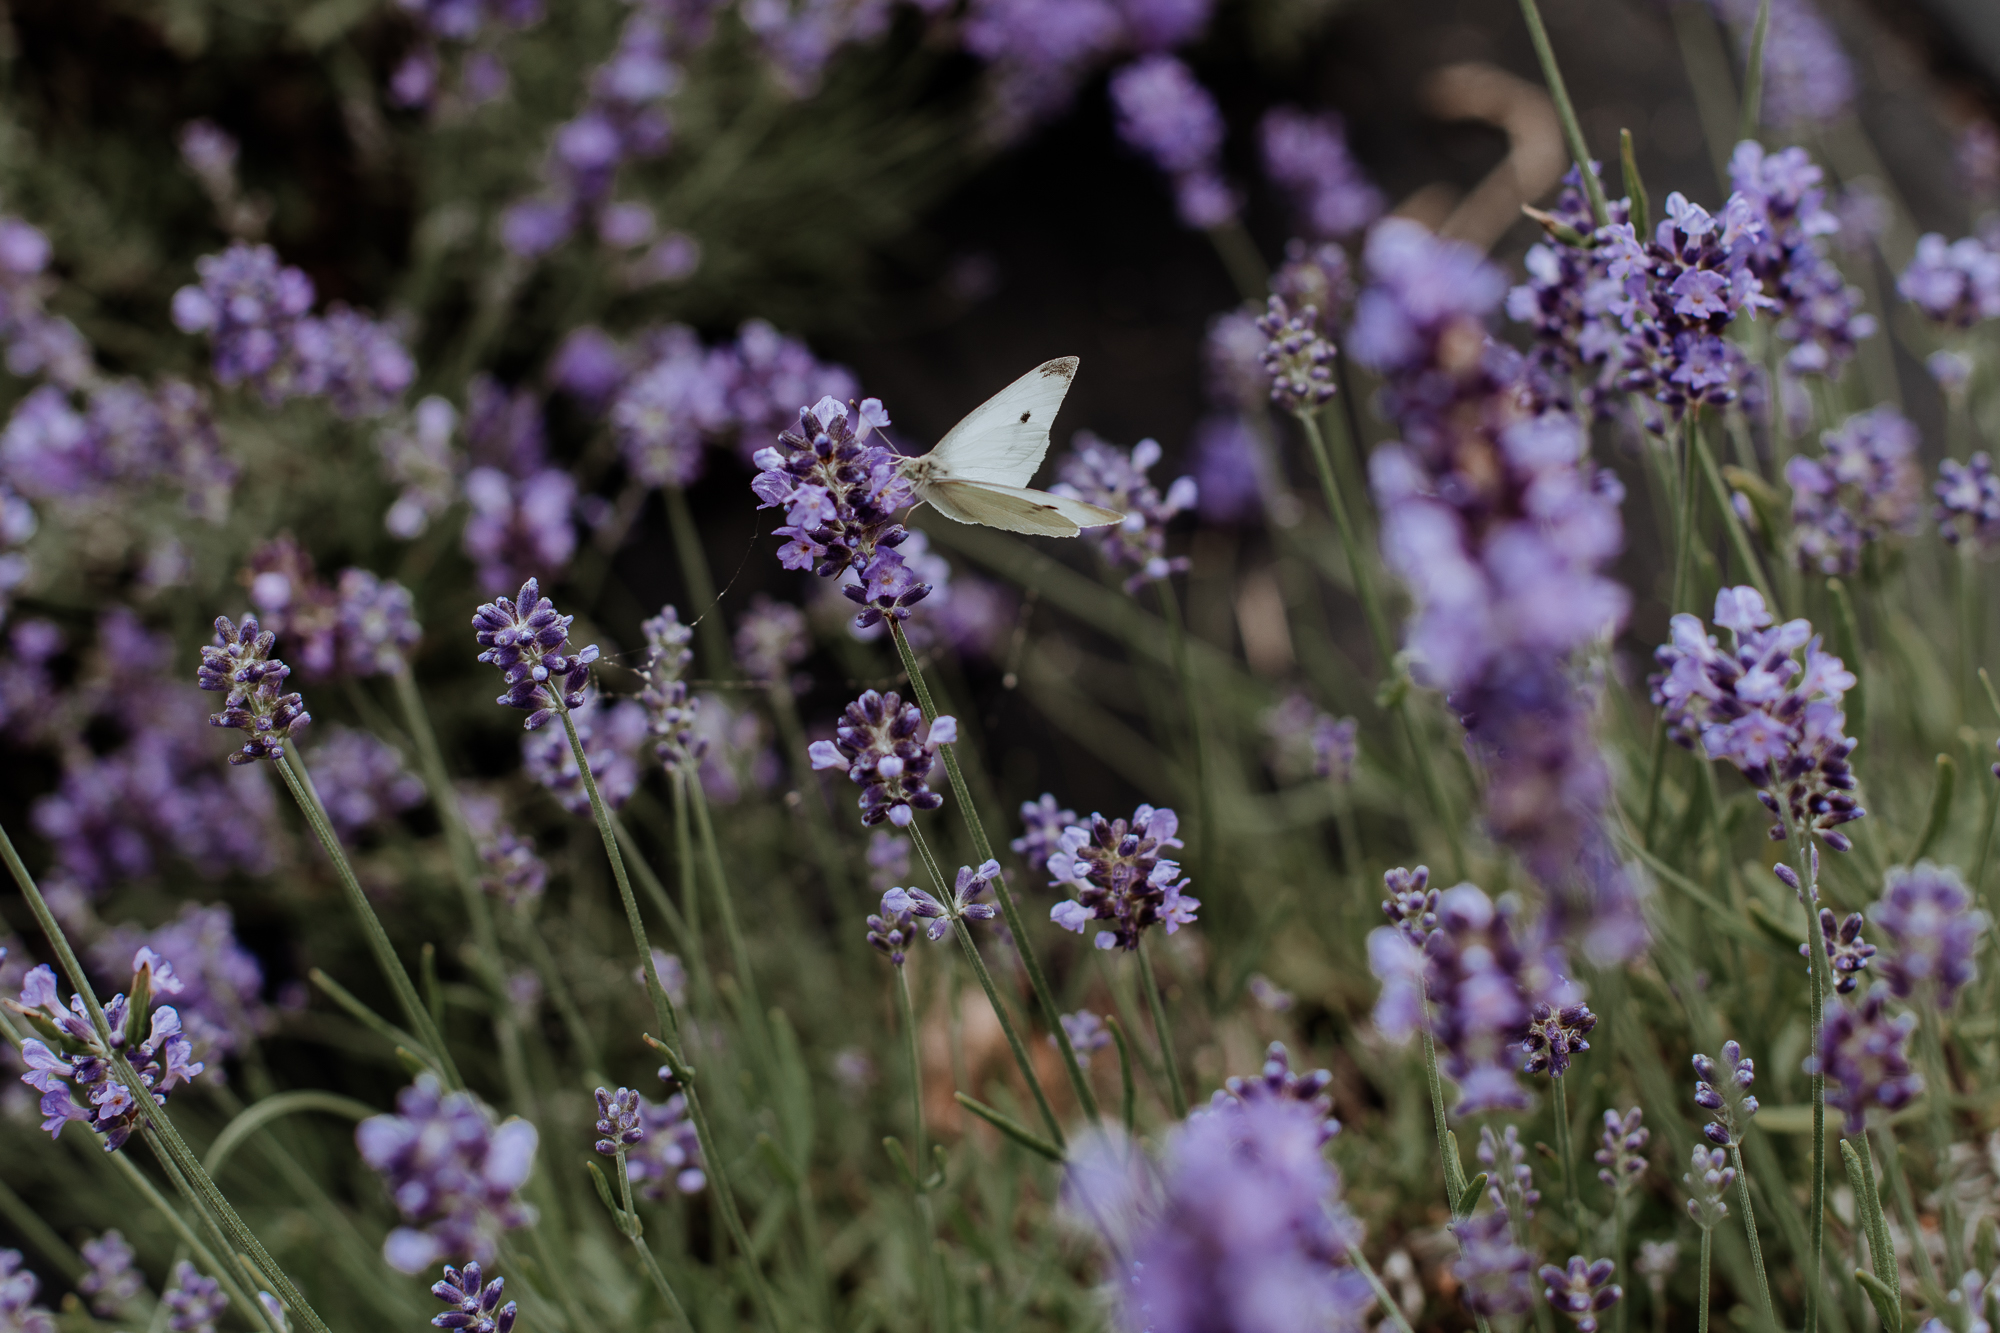 peace-valley-lavender-farm-natural-philadelphia-photography-34